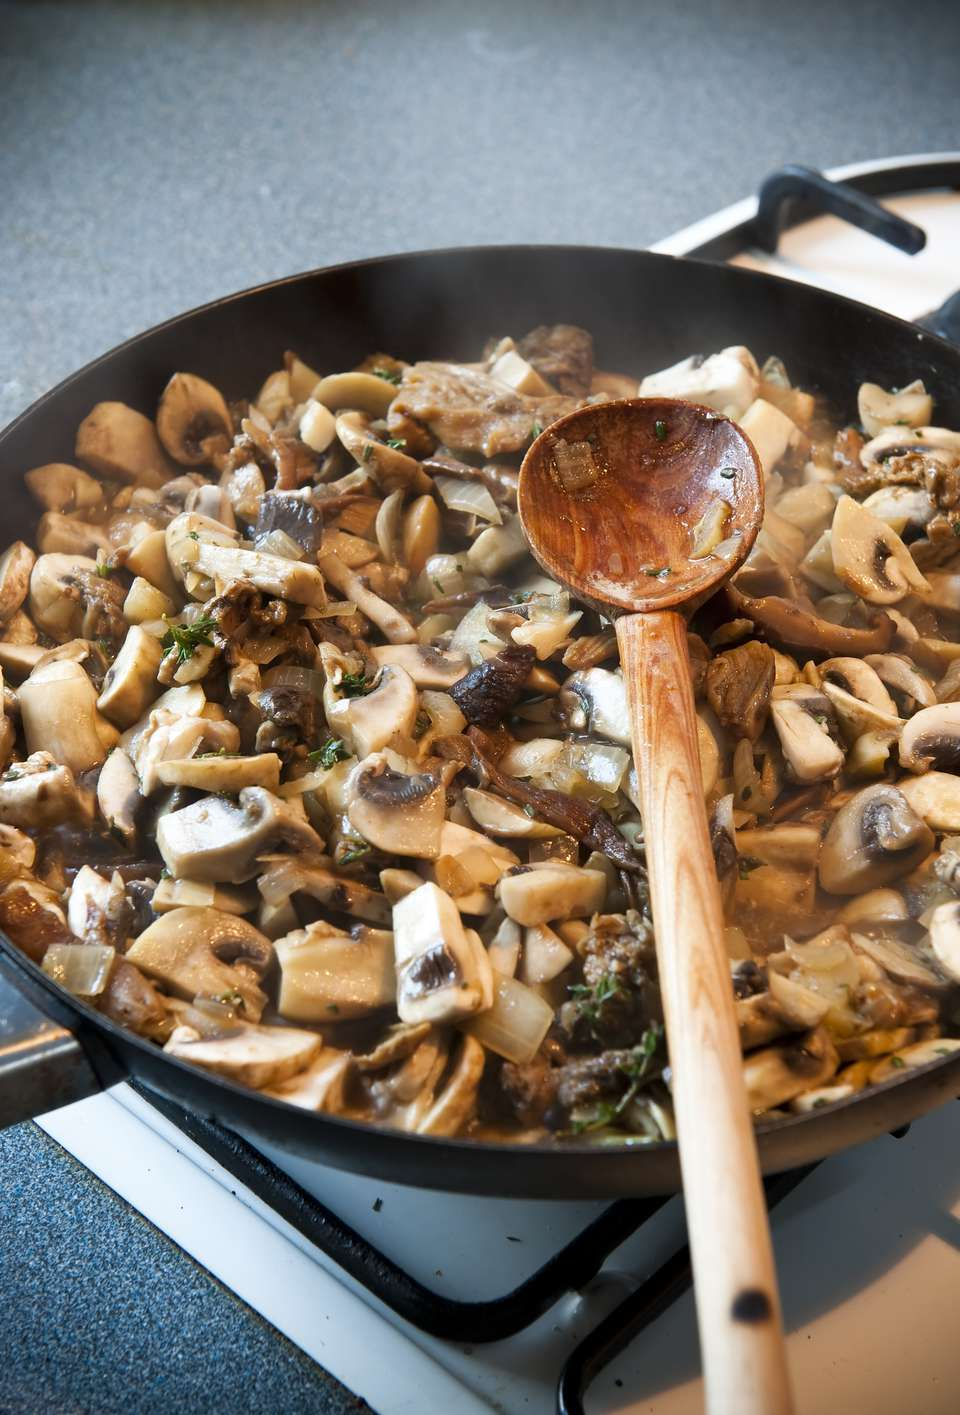 Mushroom frying pan gas stove wooden spoon